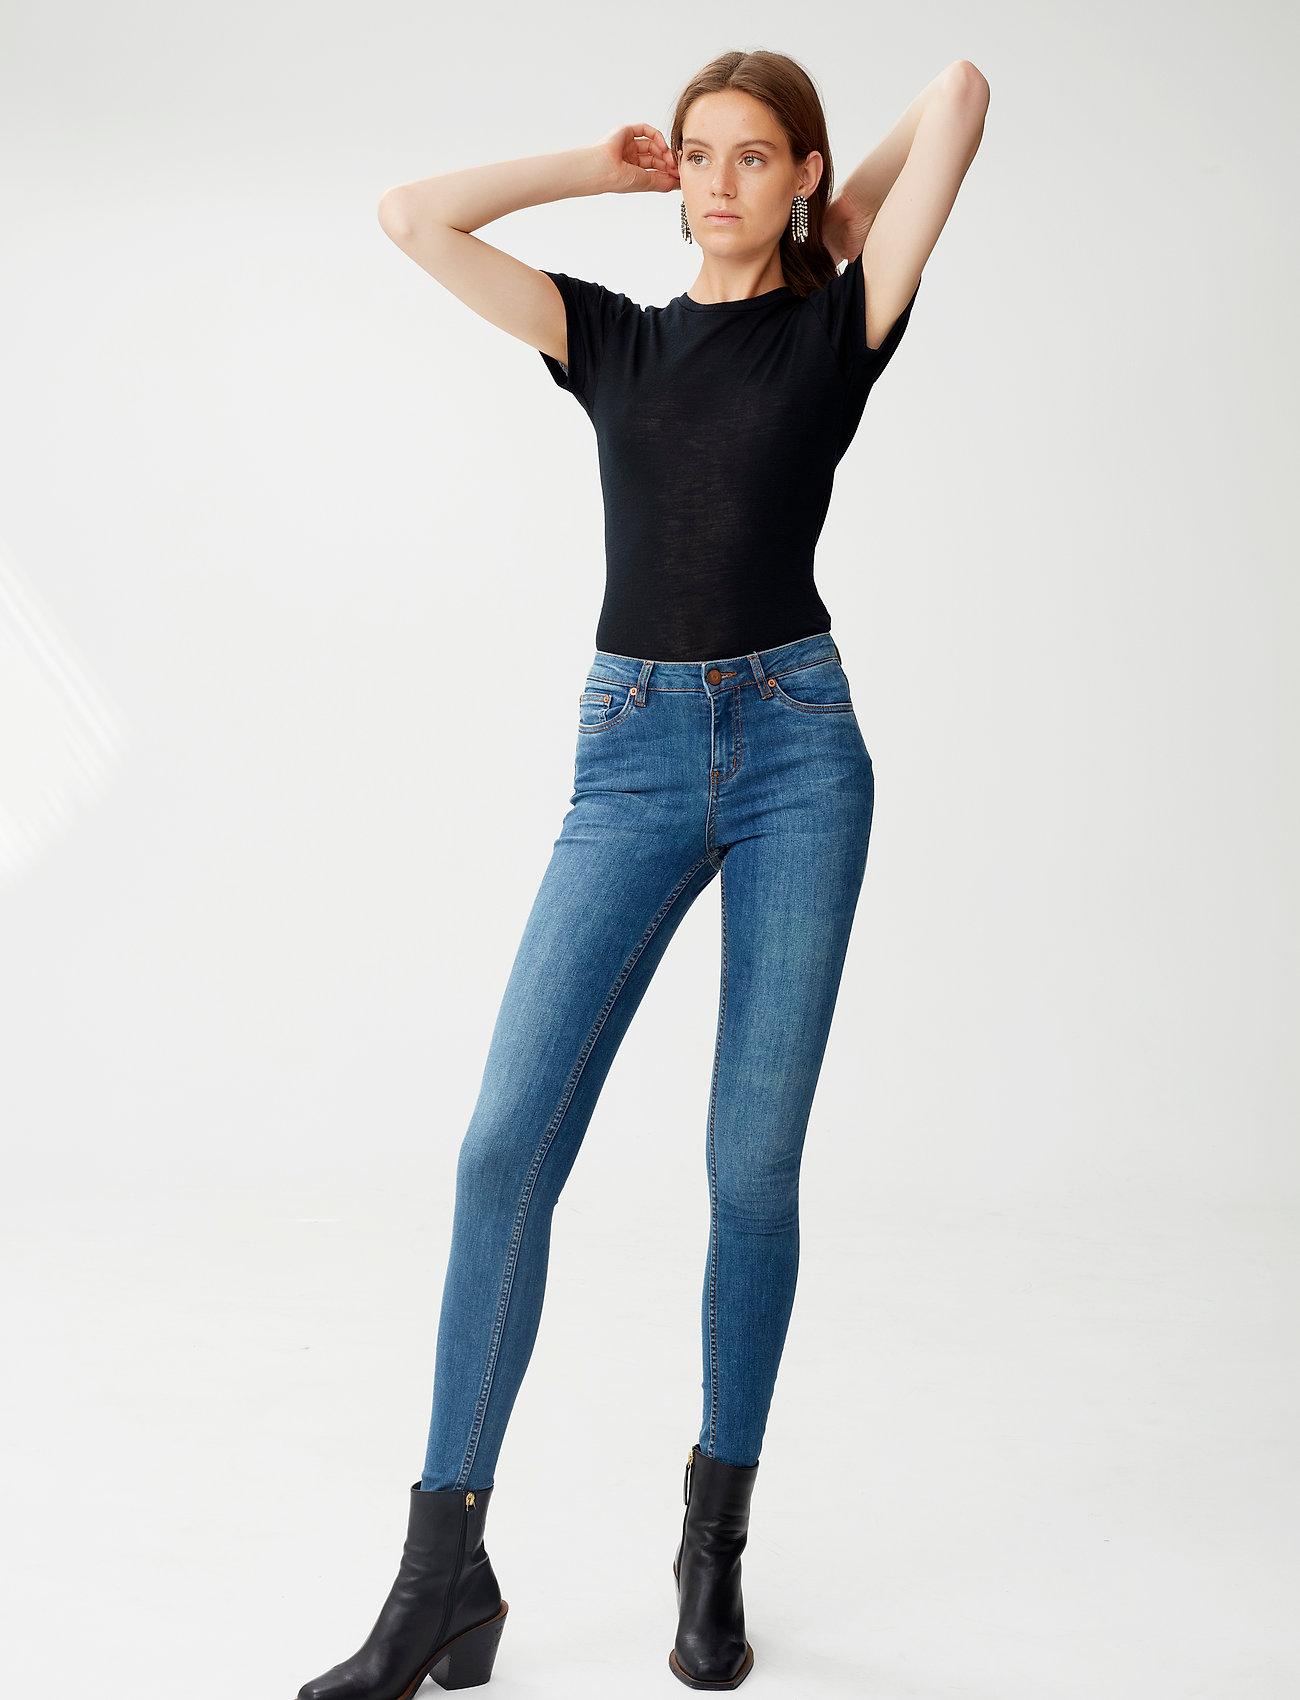 Gestuz - WilmaGZ tee NOOS - basic t-shirts - black - 0